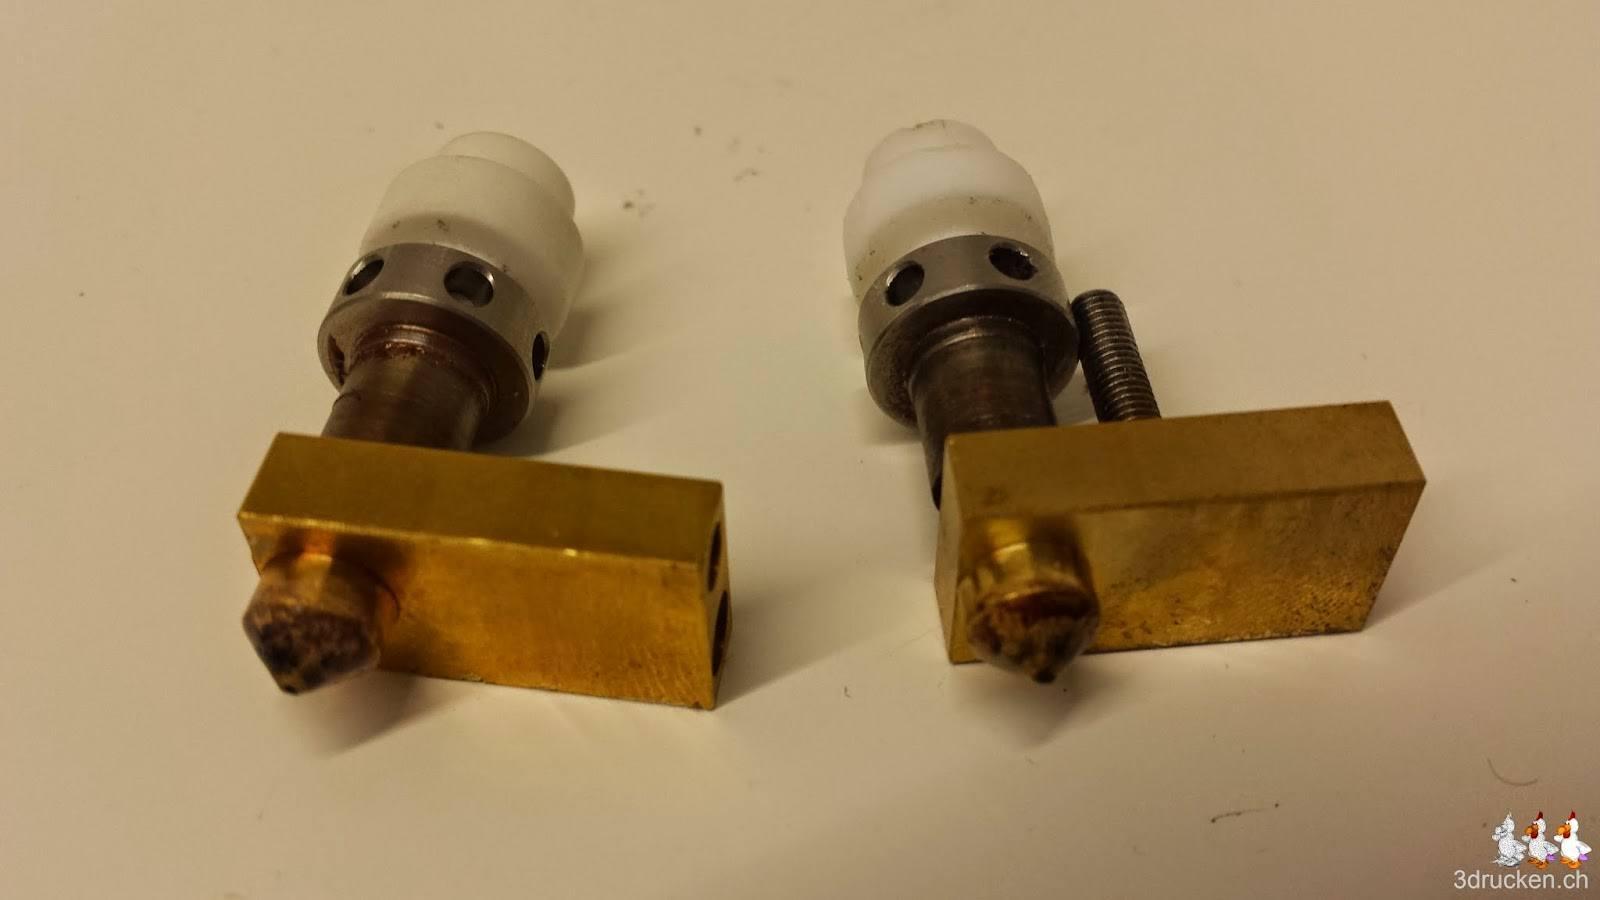 Foto zweier verbrauchter Sets an Düsen und Isolatoren